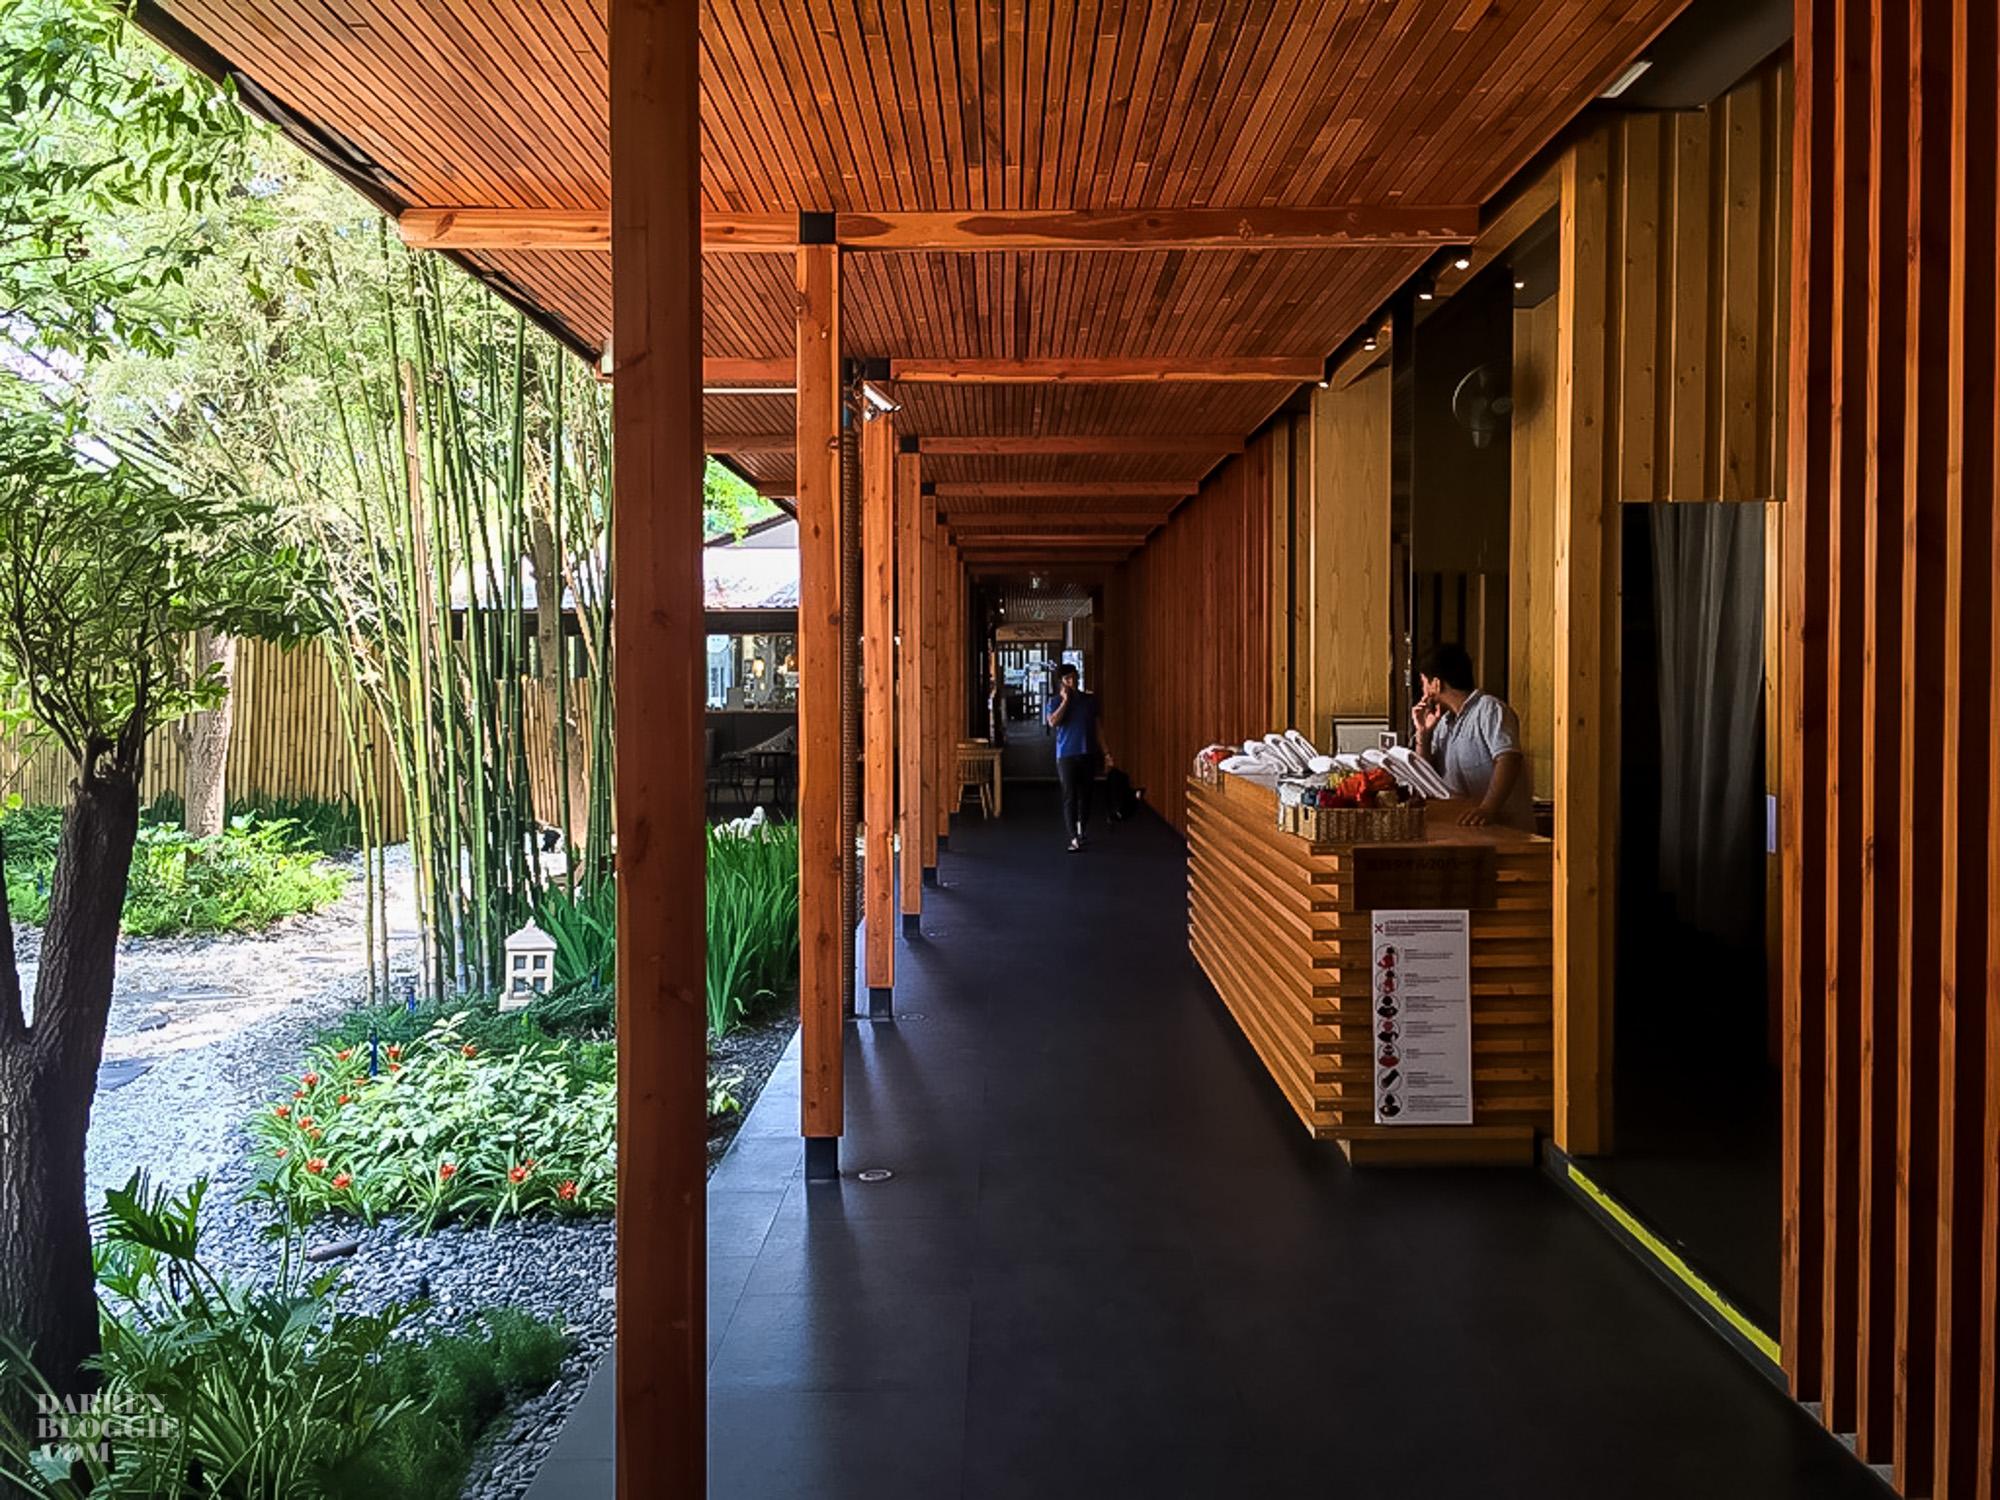 yunomori-onsen-spa-bangkok-thailand-6